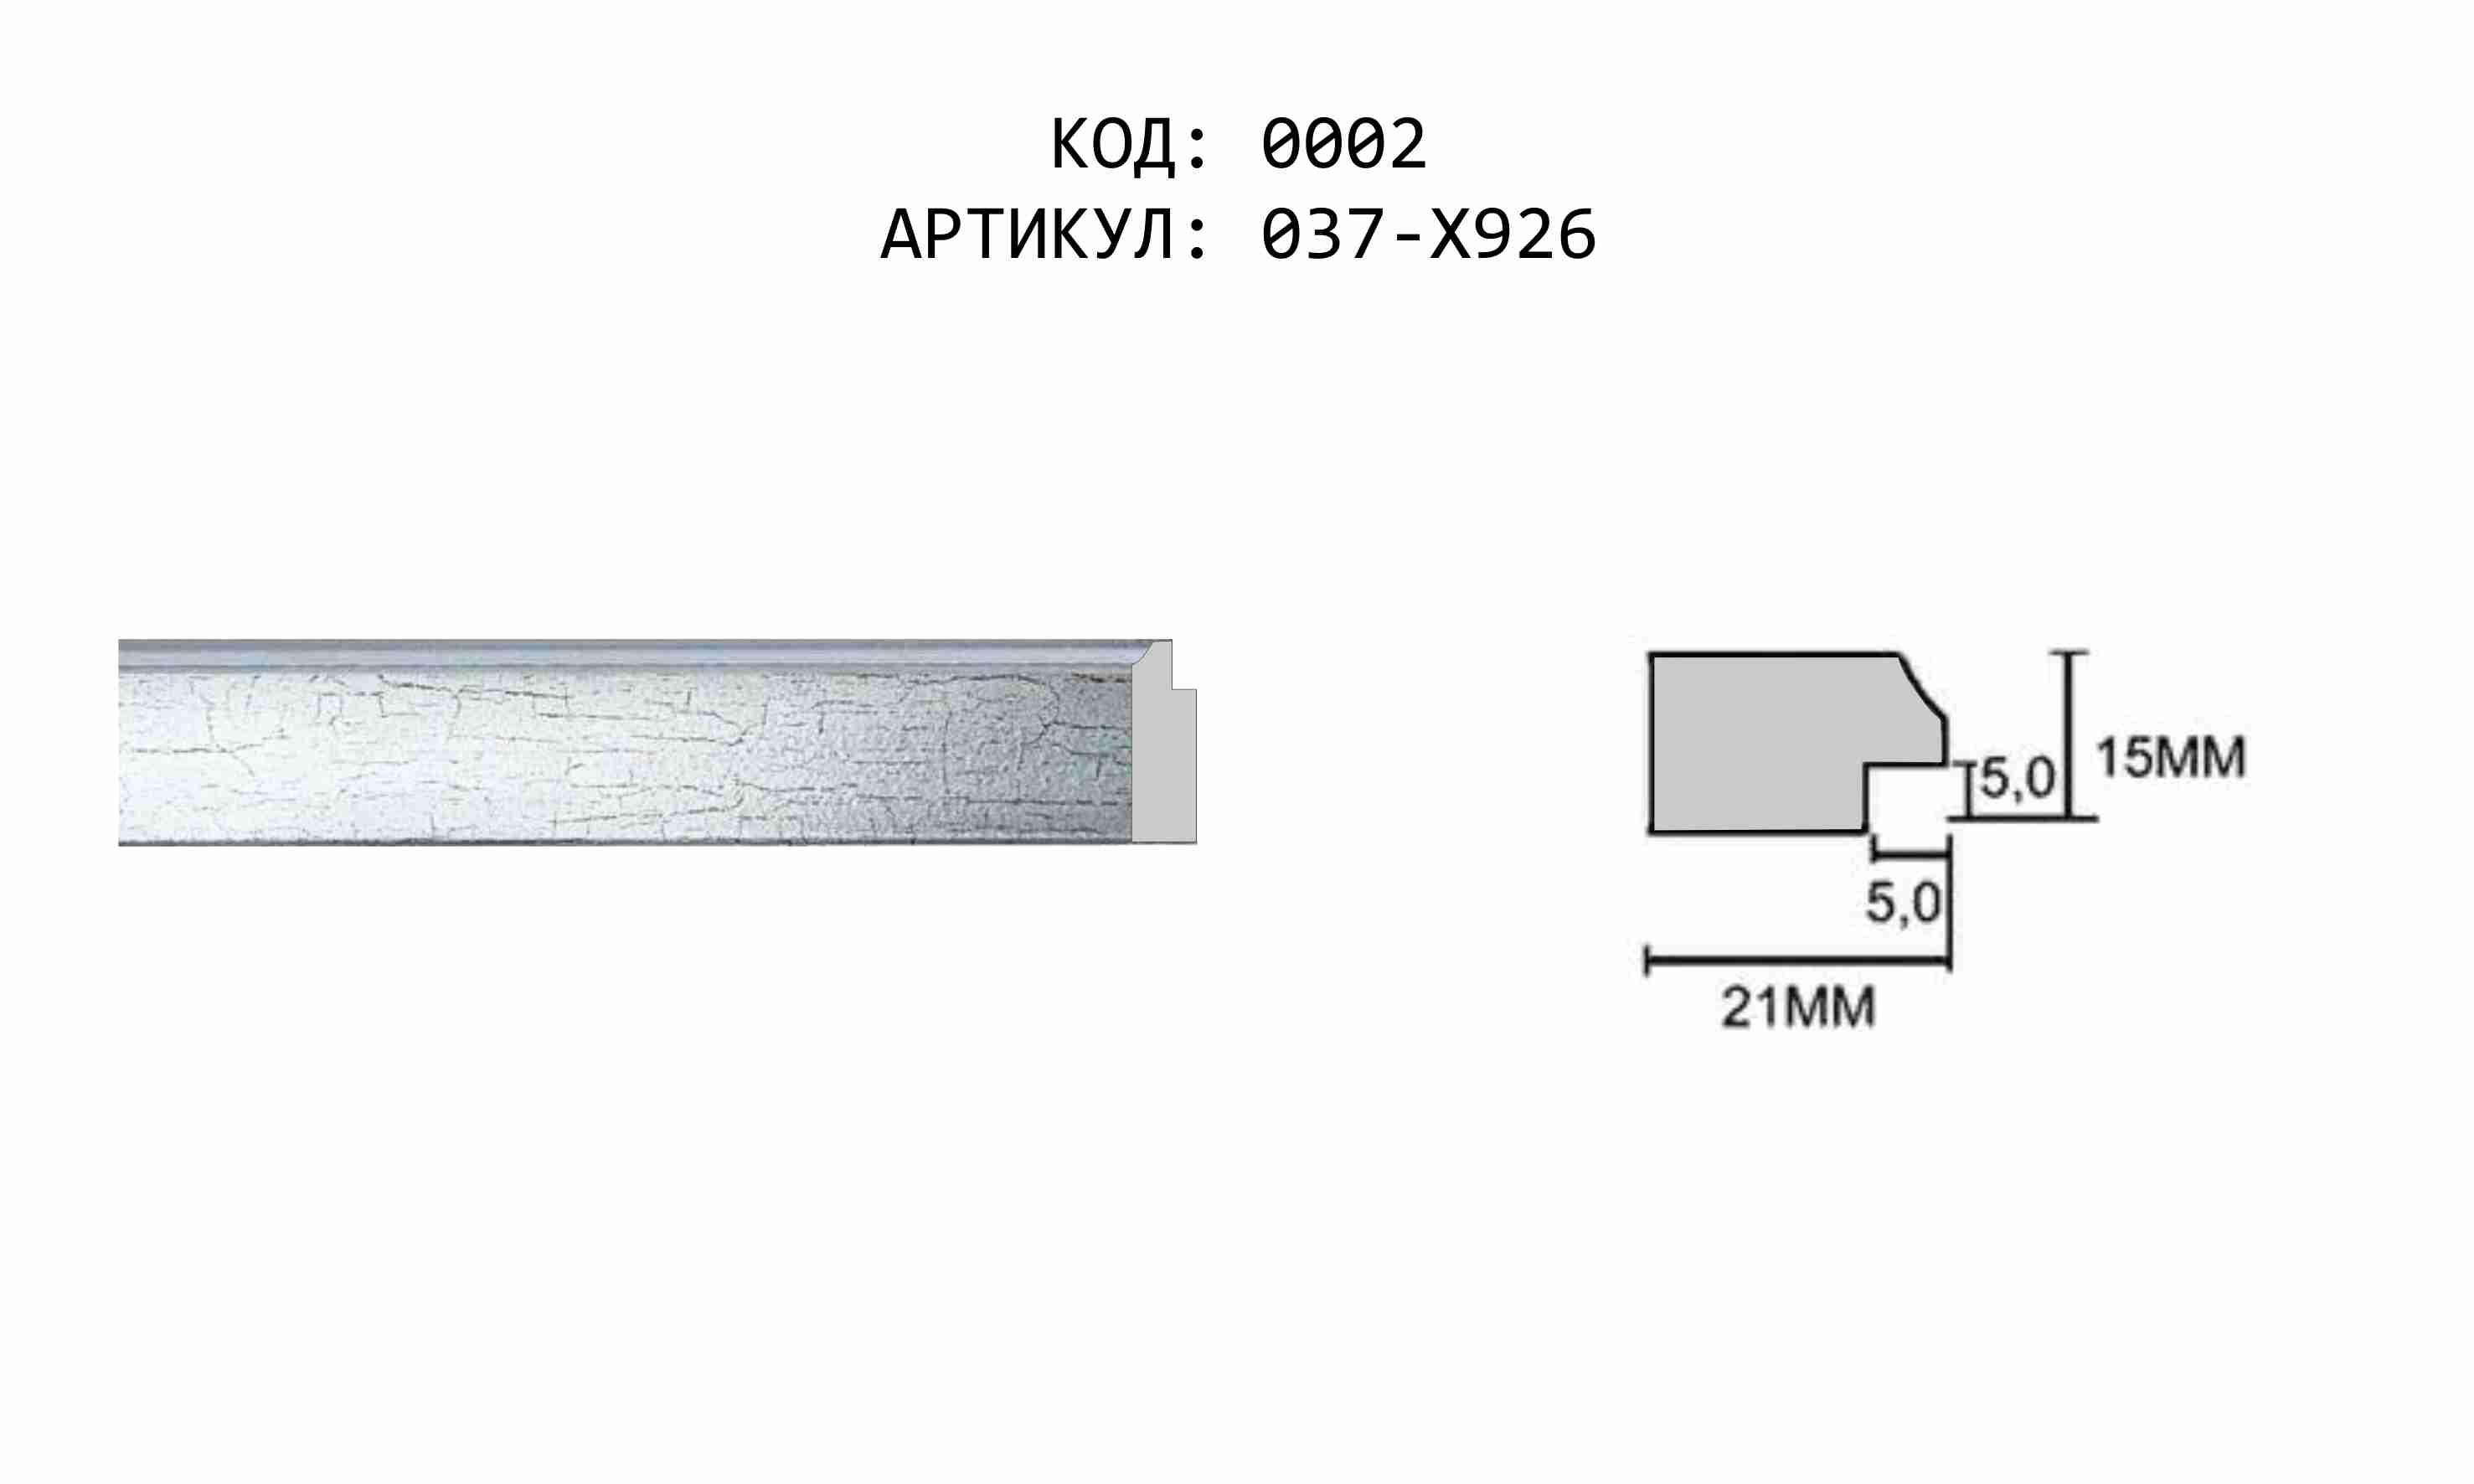 Артикул: 037-X926